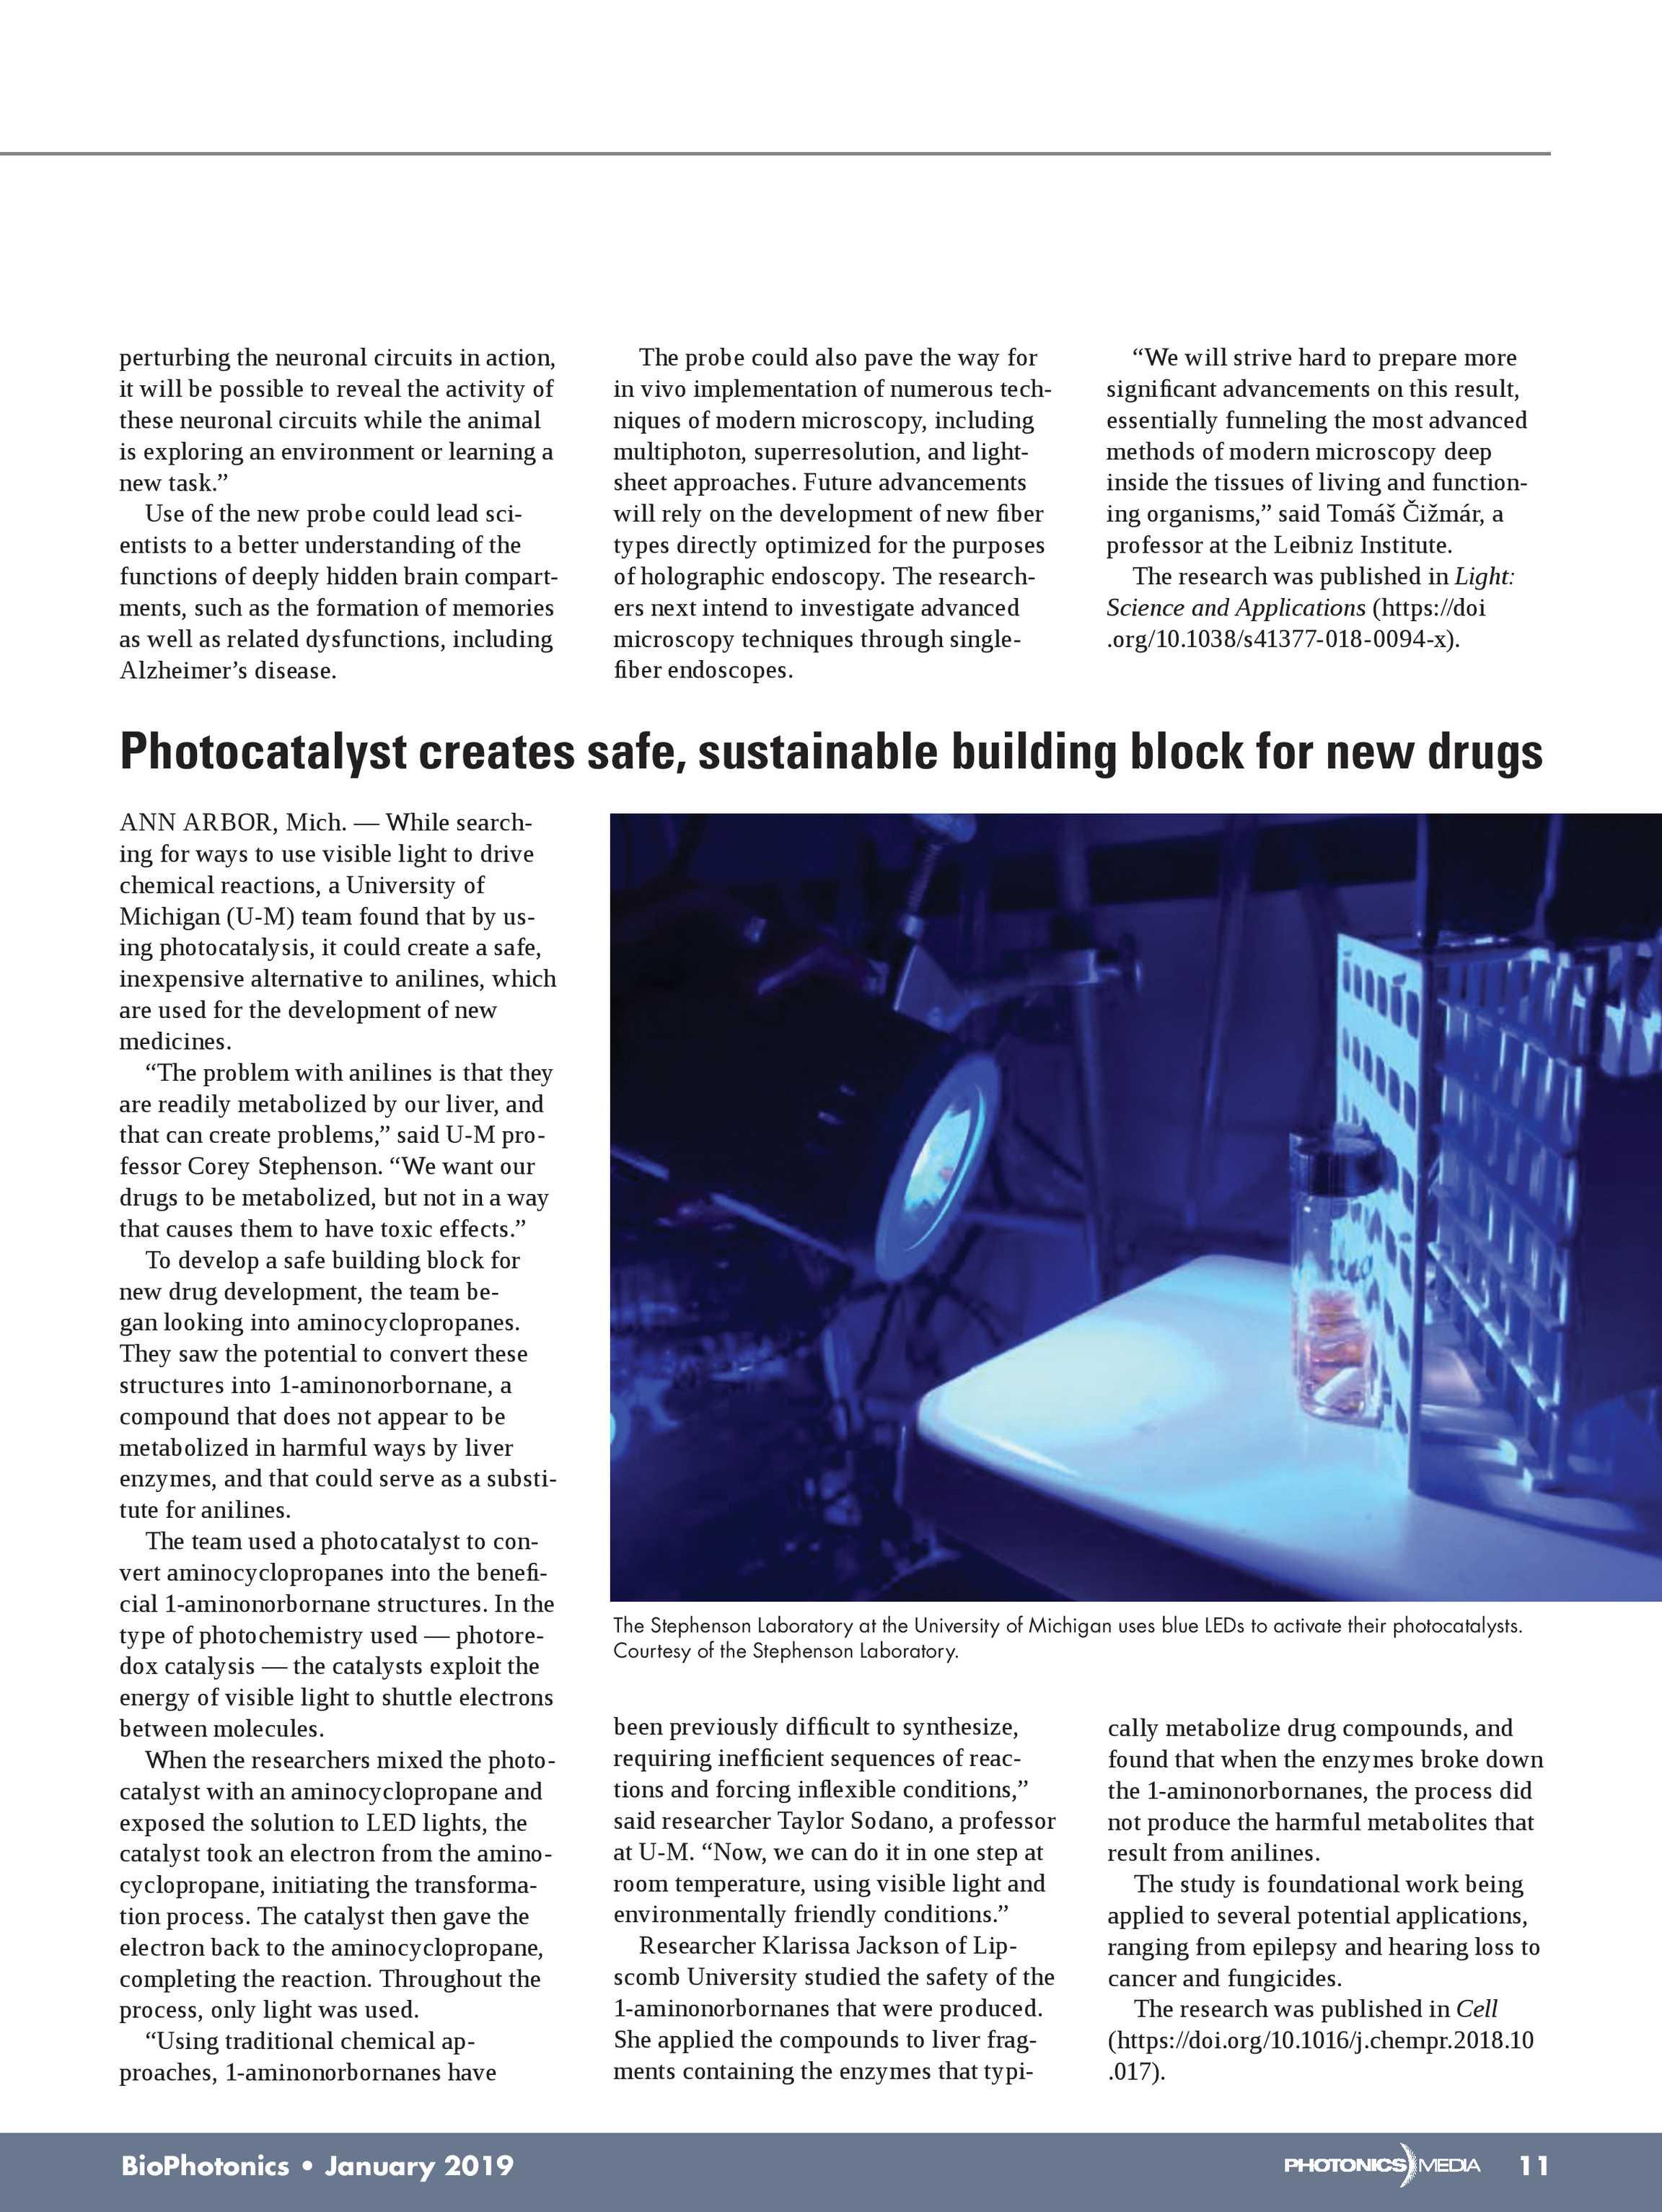 Bio Photonics - January 2019 - page 11